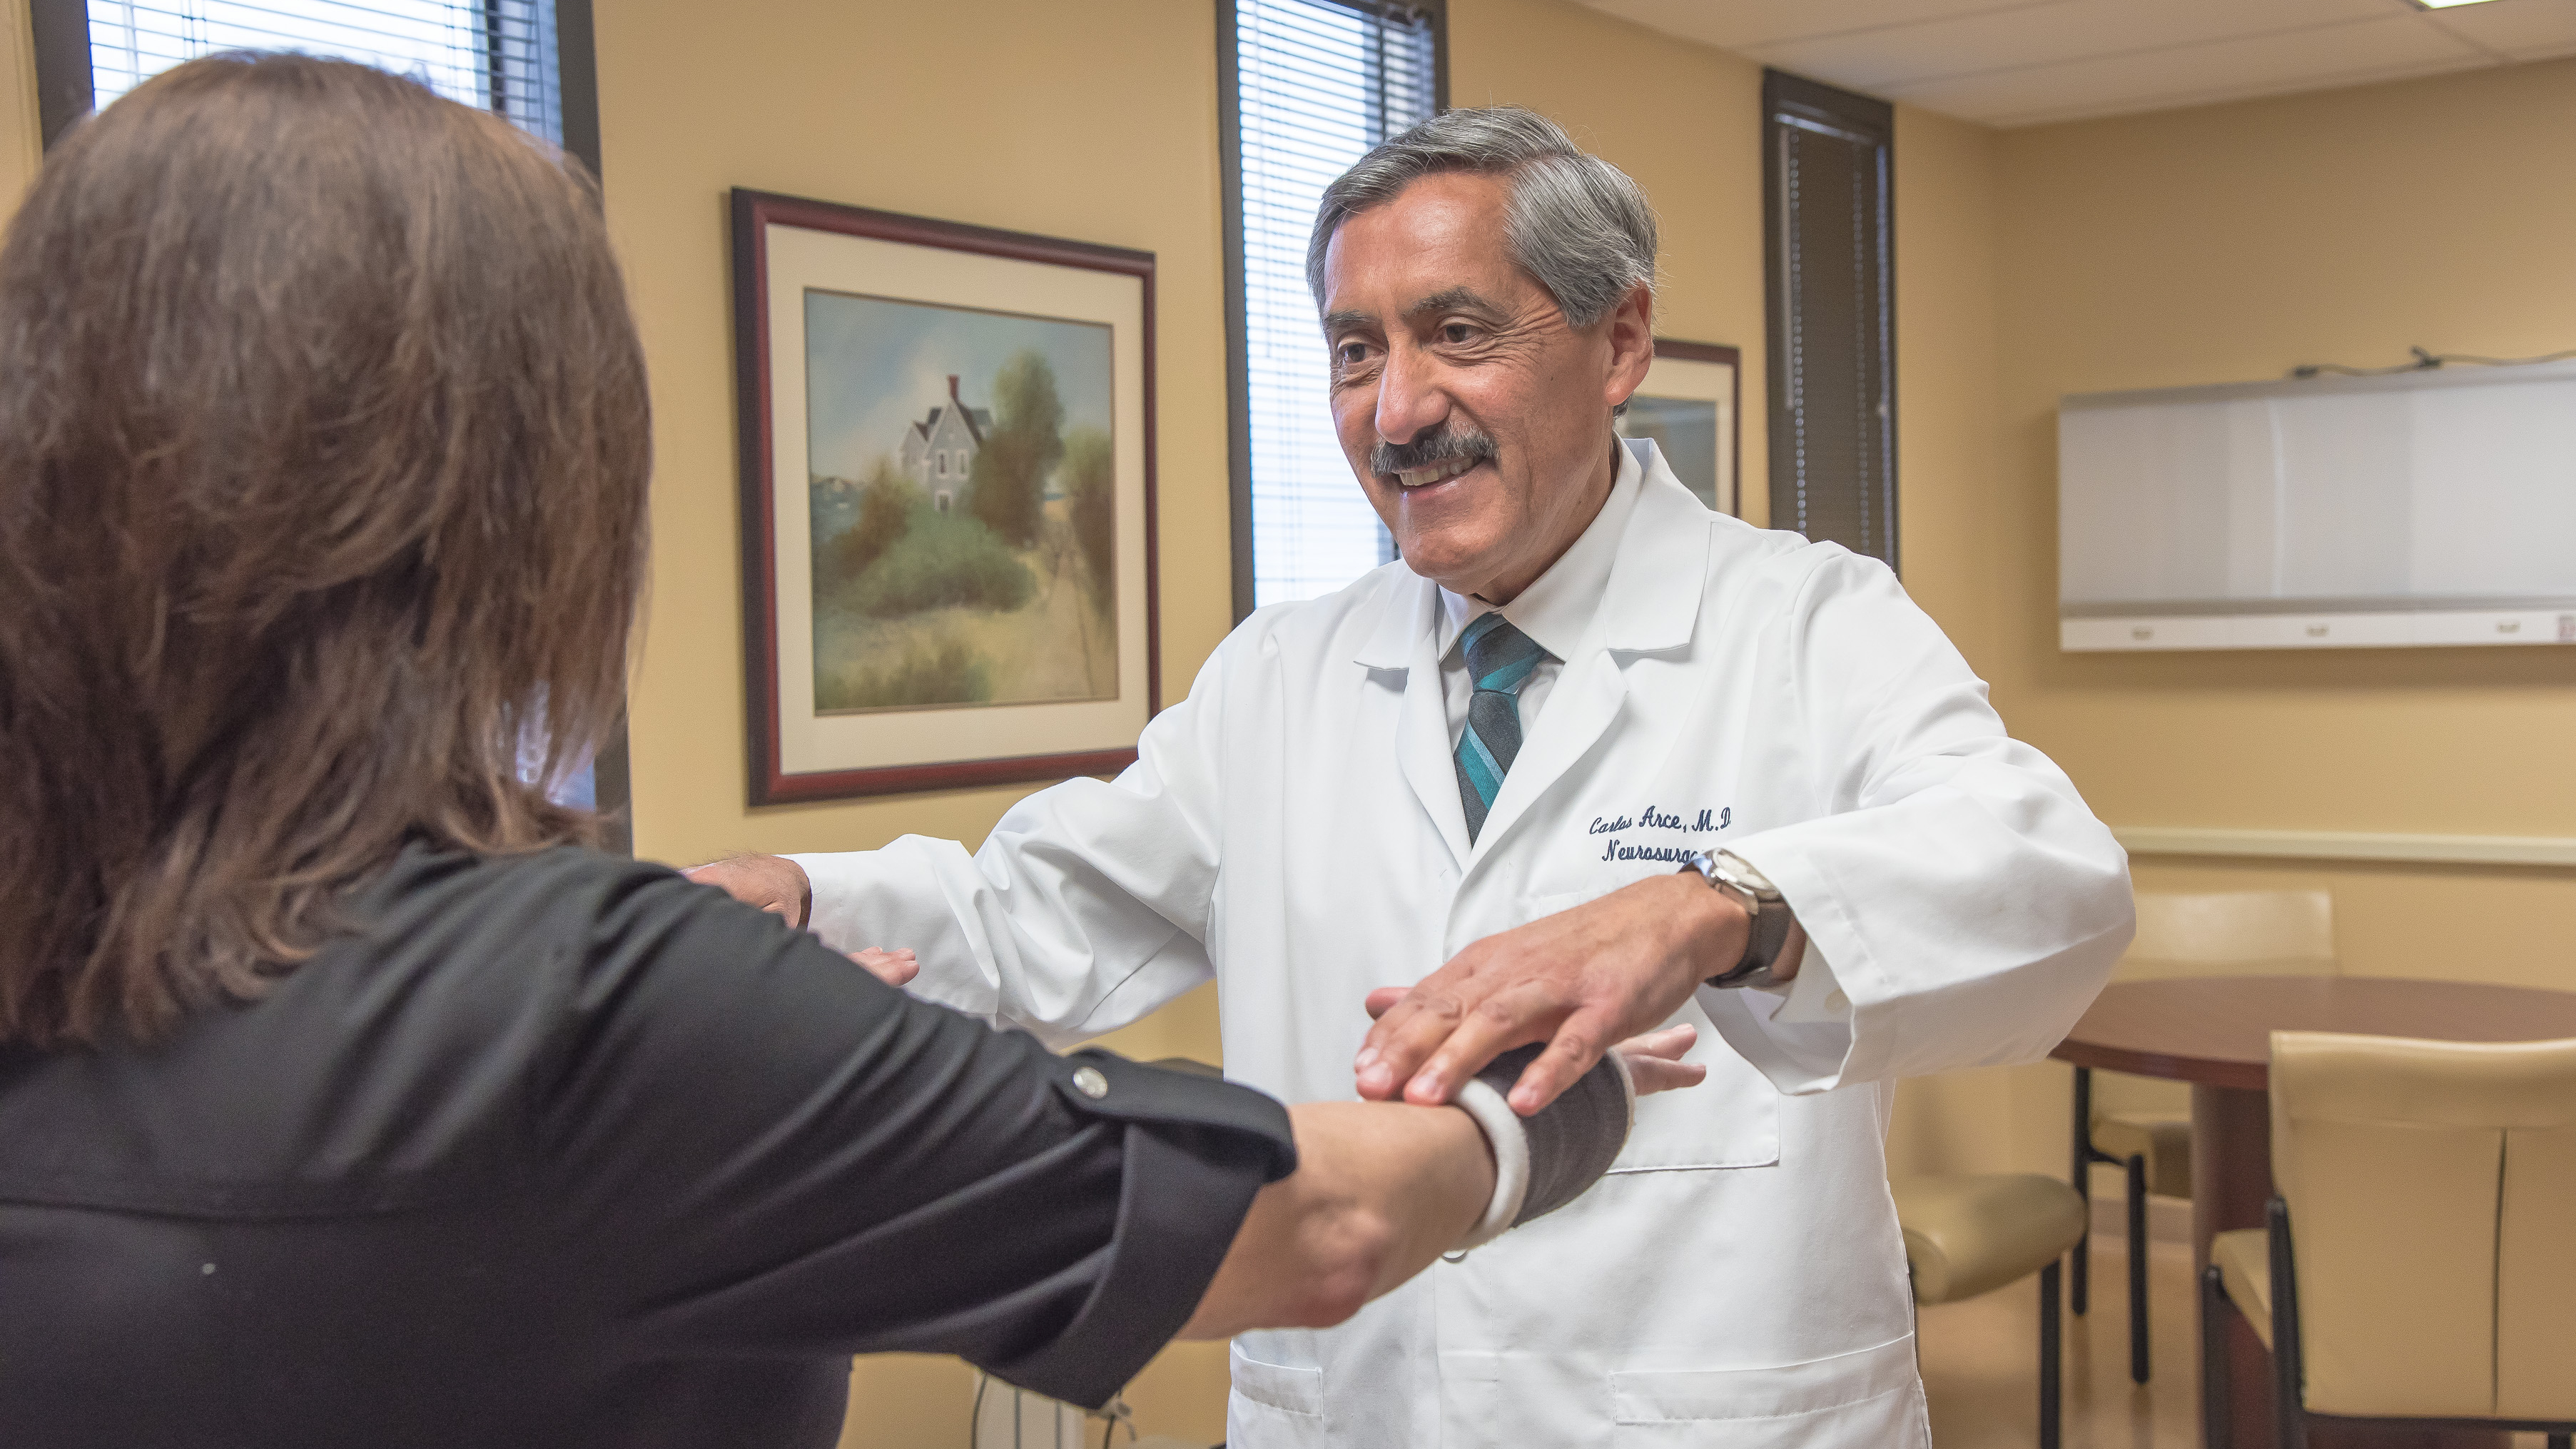 Dr. Arce examining a patient.